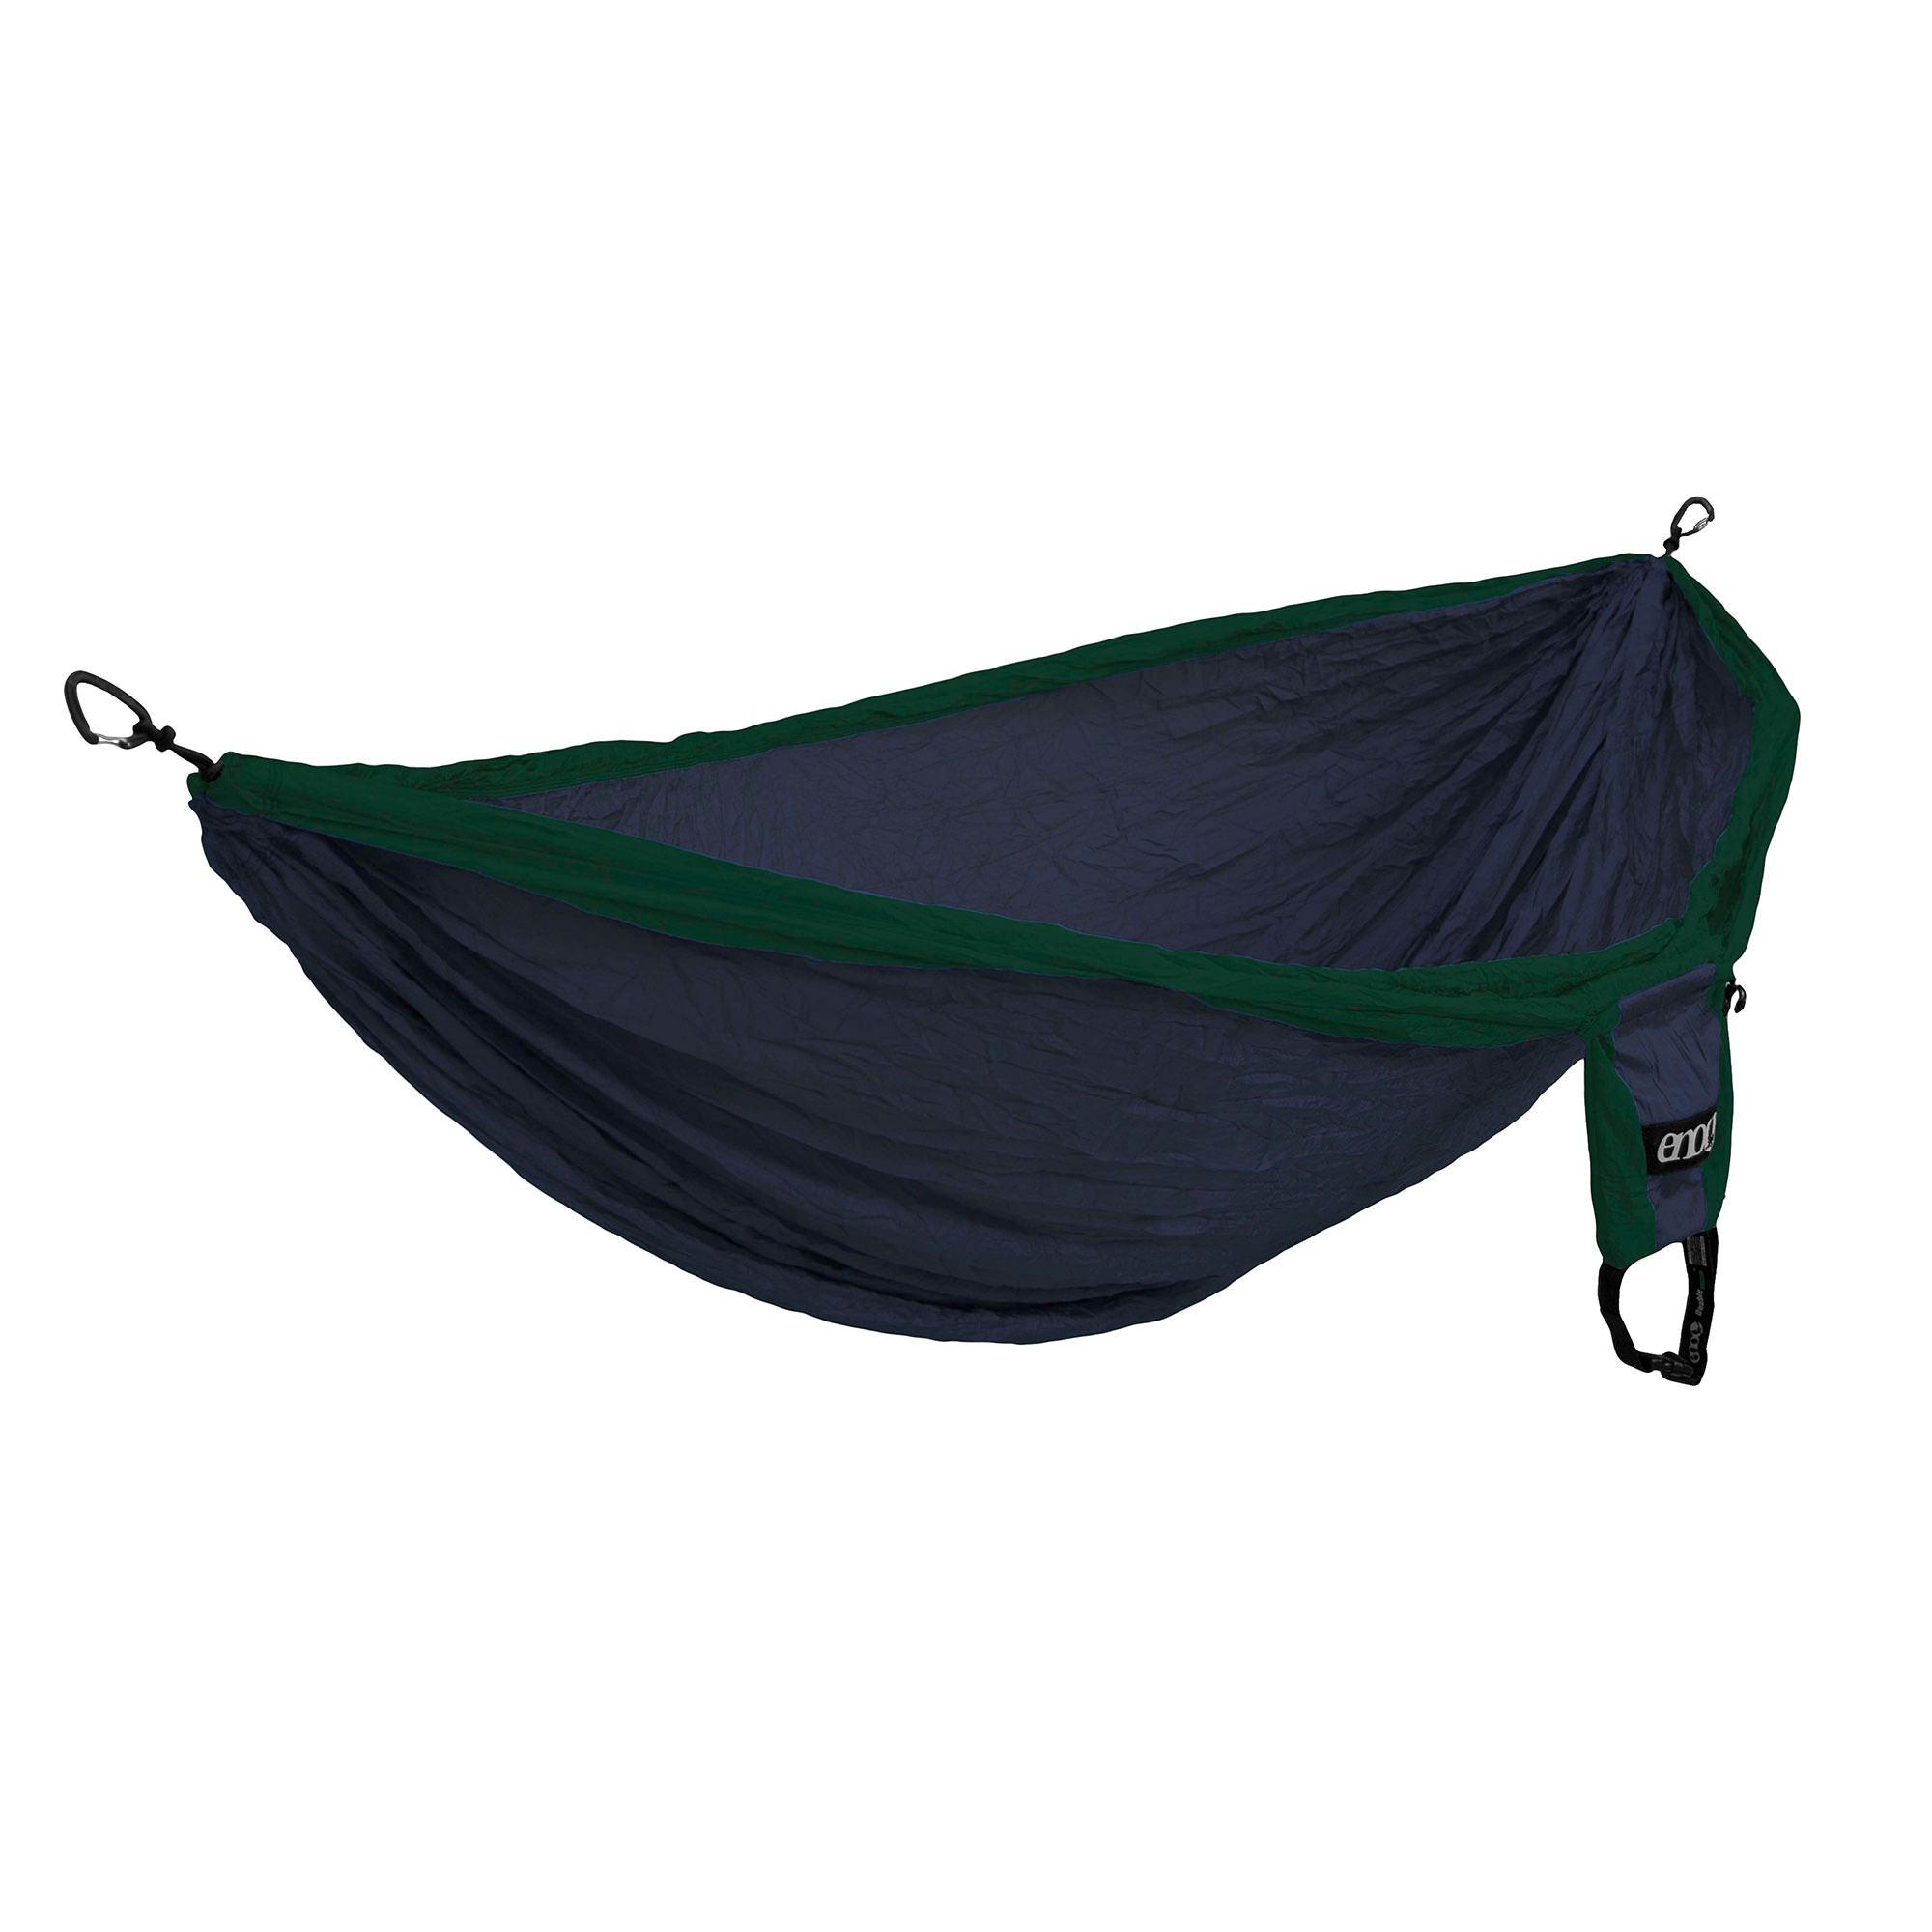 Eno hammock single or double